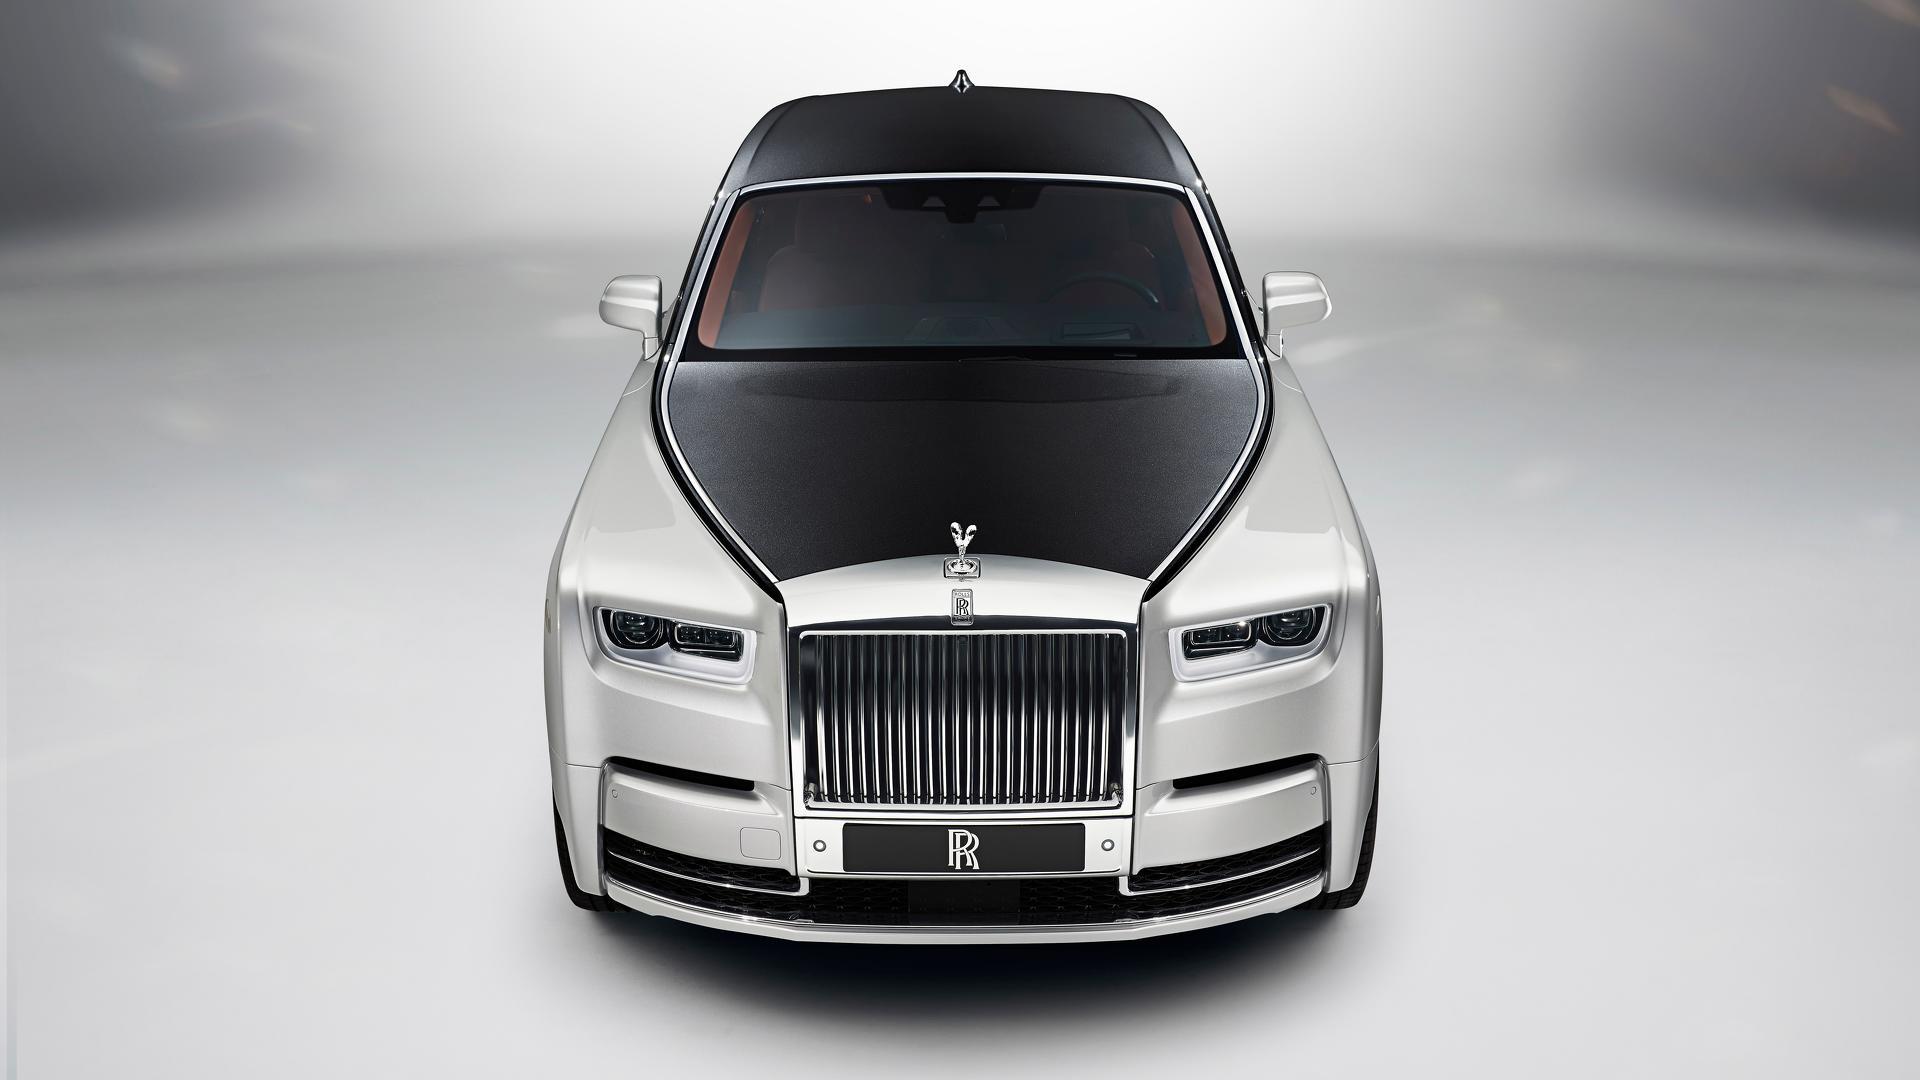 2018 Rolls Royce Phantom Opulent Doesnt Do It Justice Trumph Boots Darkbrown